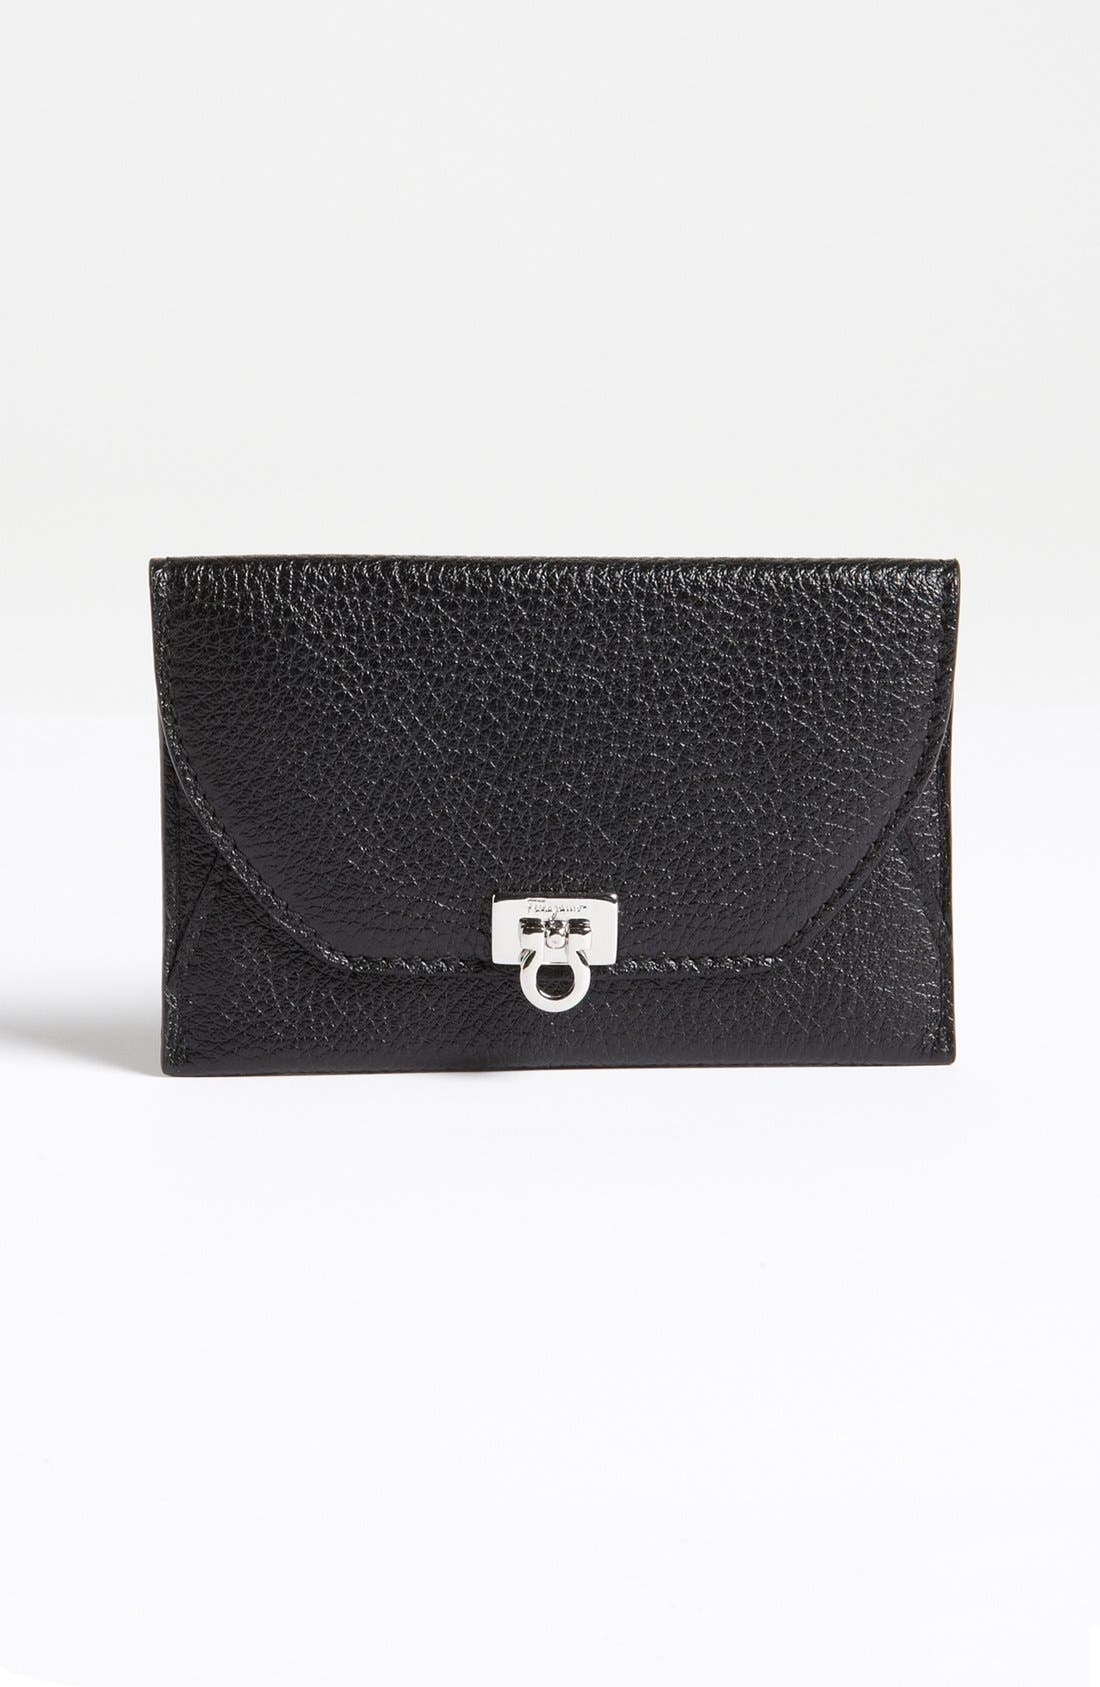 Alternate Image 1 Selected - Salvatore Ferragamo 'Safari' Leather Card Case